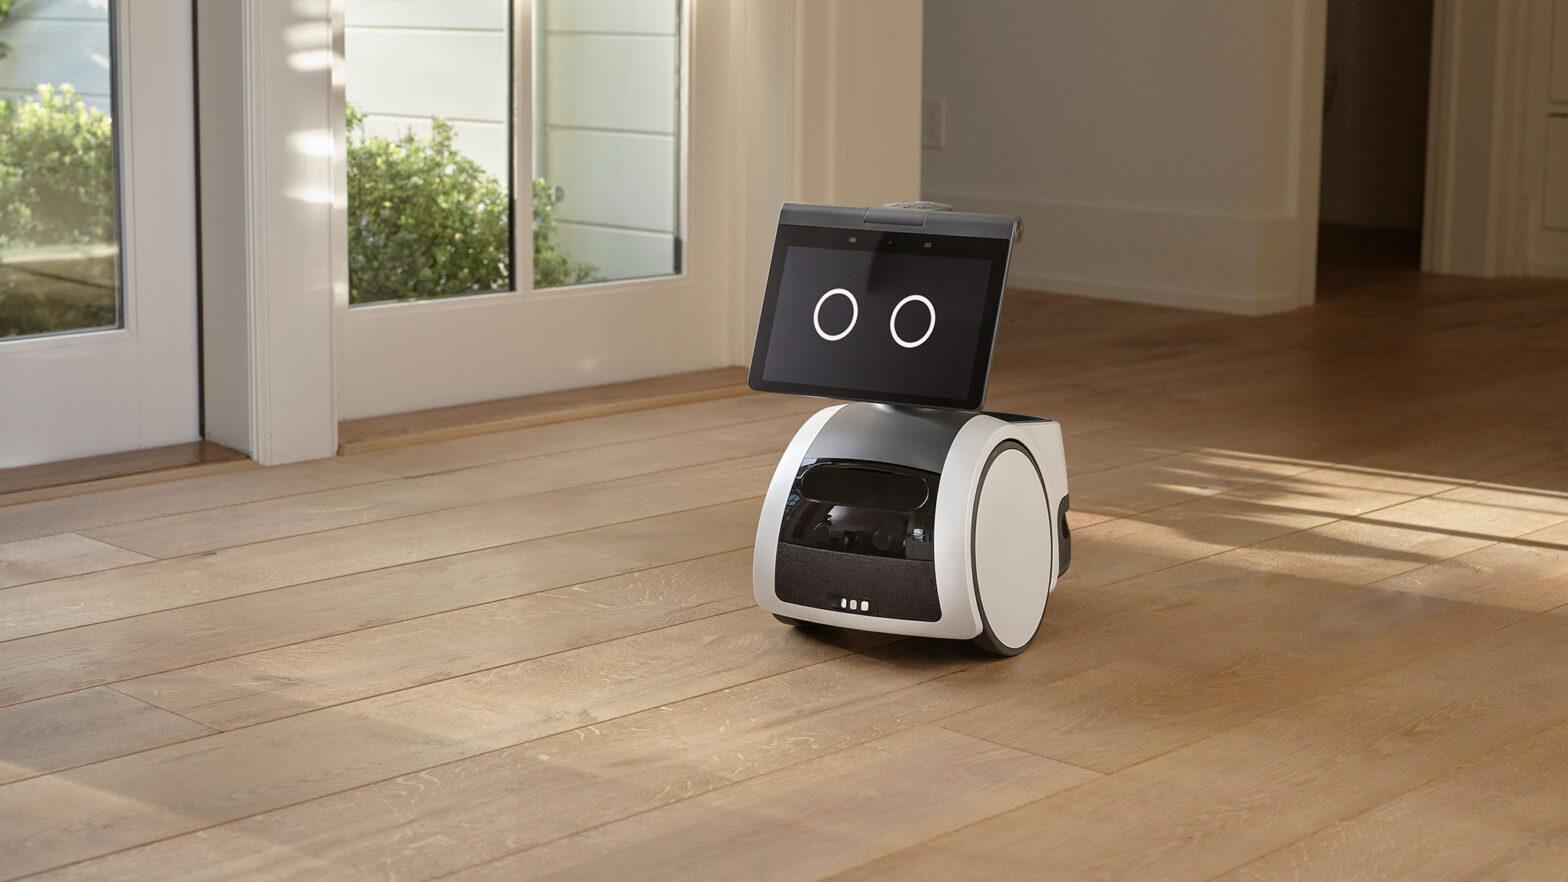 Amazon Astro Alexa-powered Household Robot